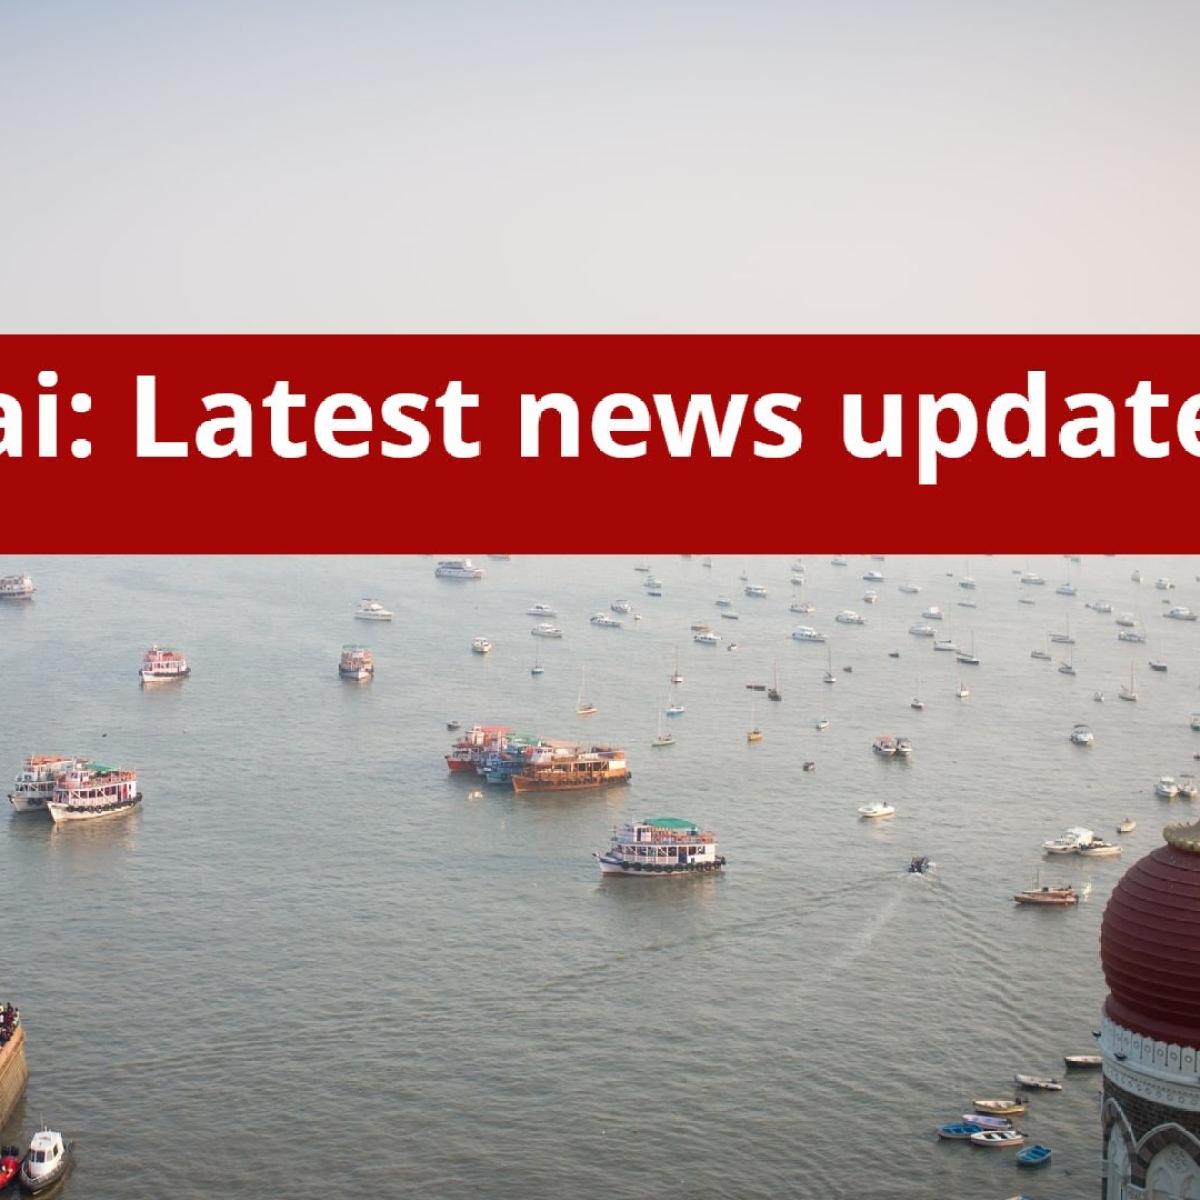 Mumbai: Latest updates on June 15